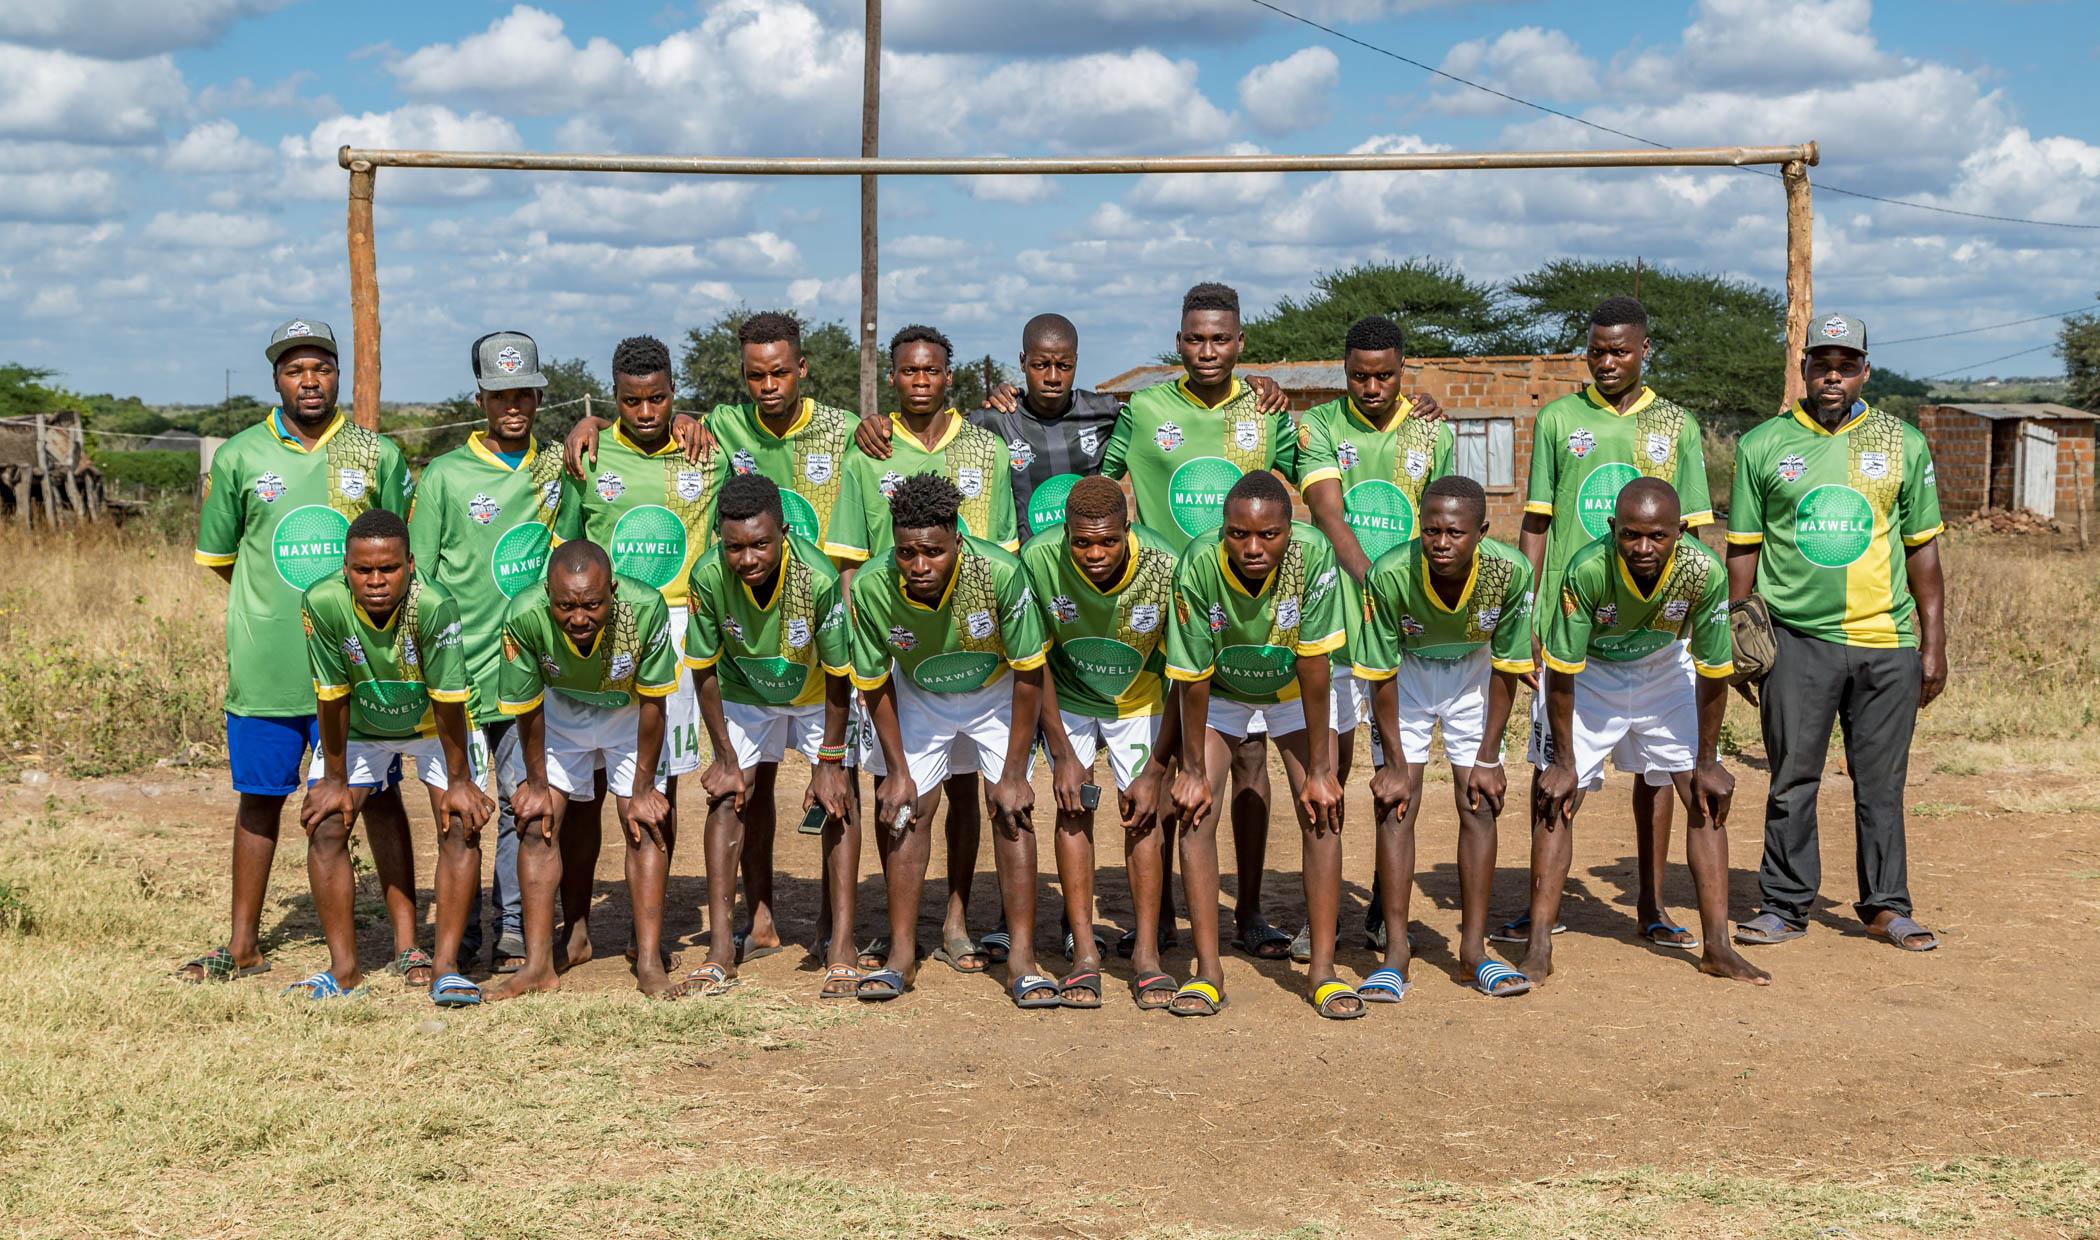 Mahungo FC Crocodiles Team Photo, Rhino Cup Champions League, May 2019